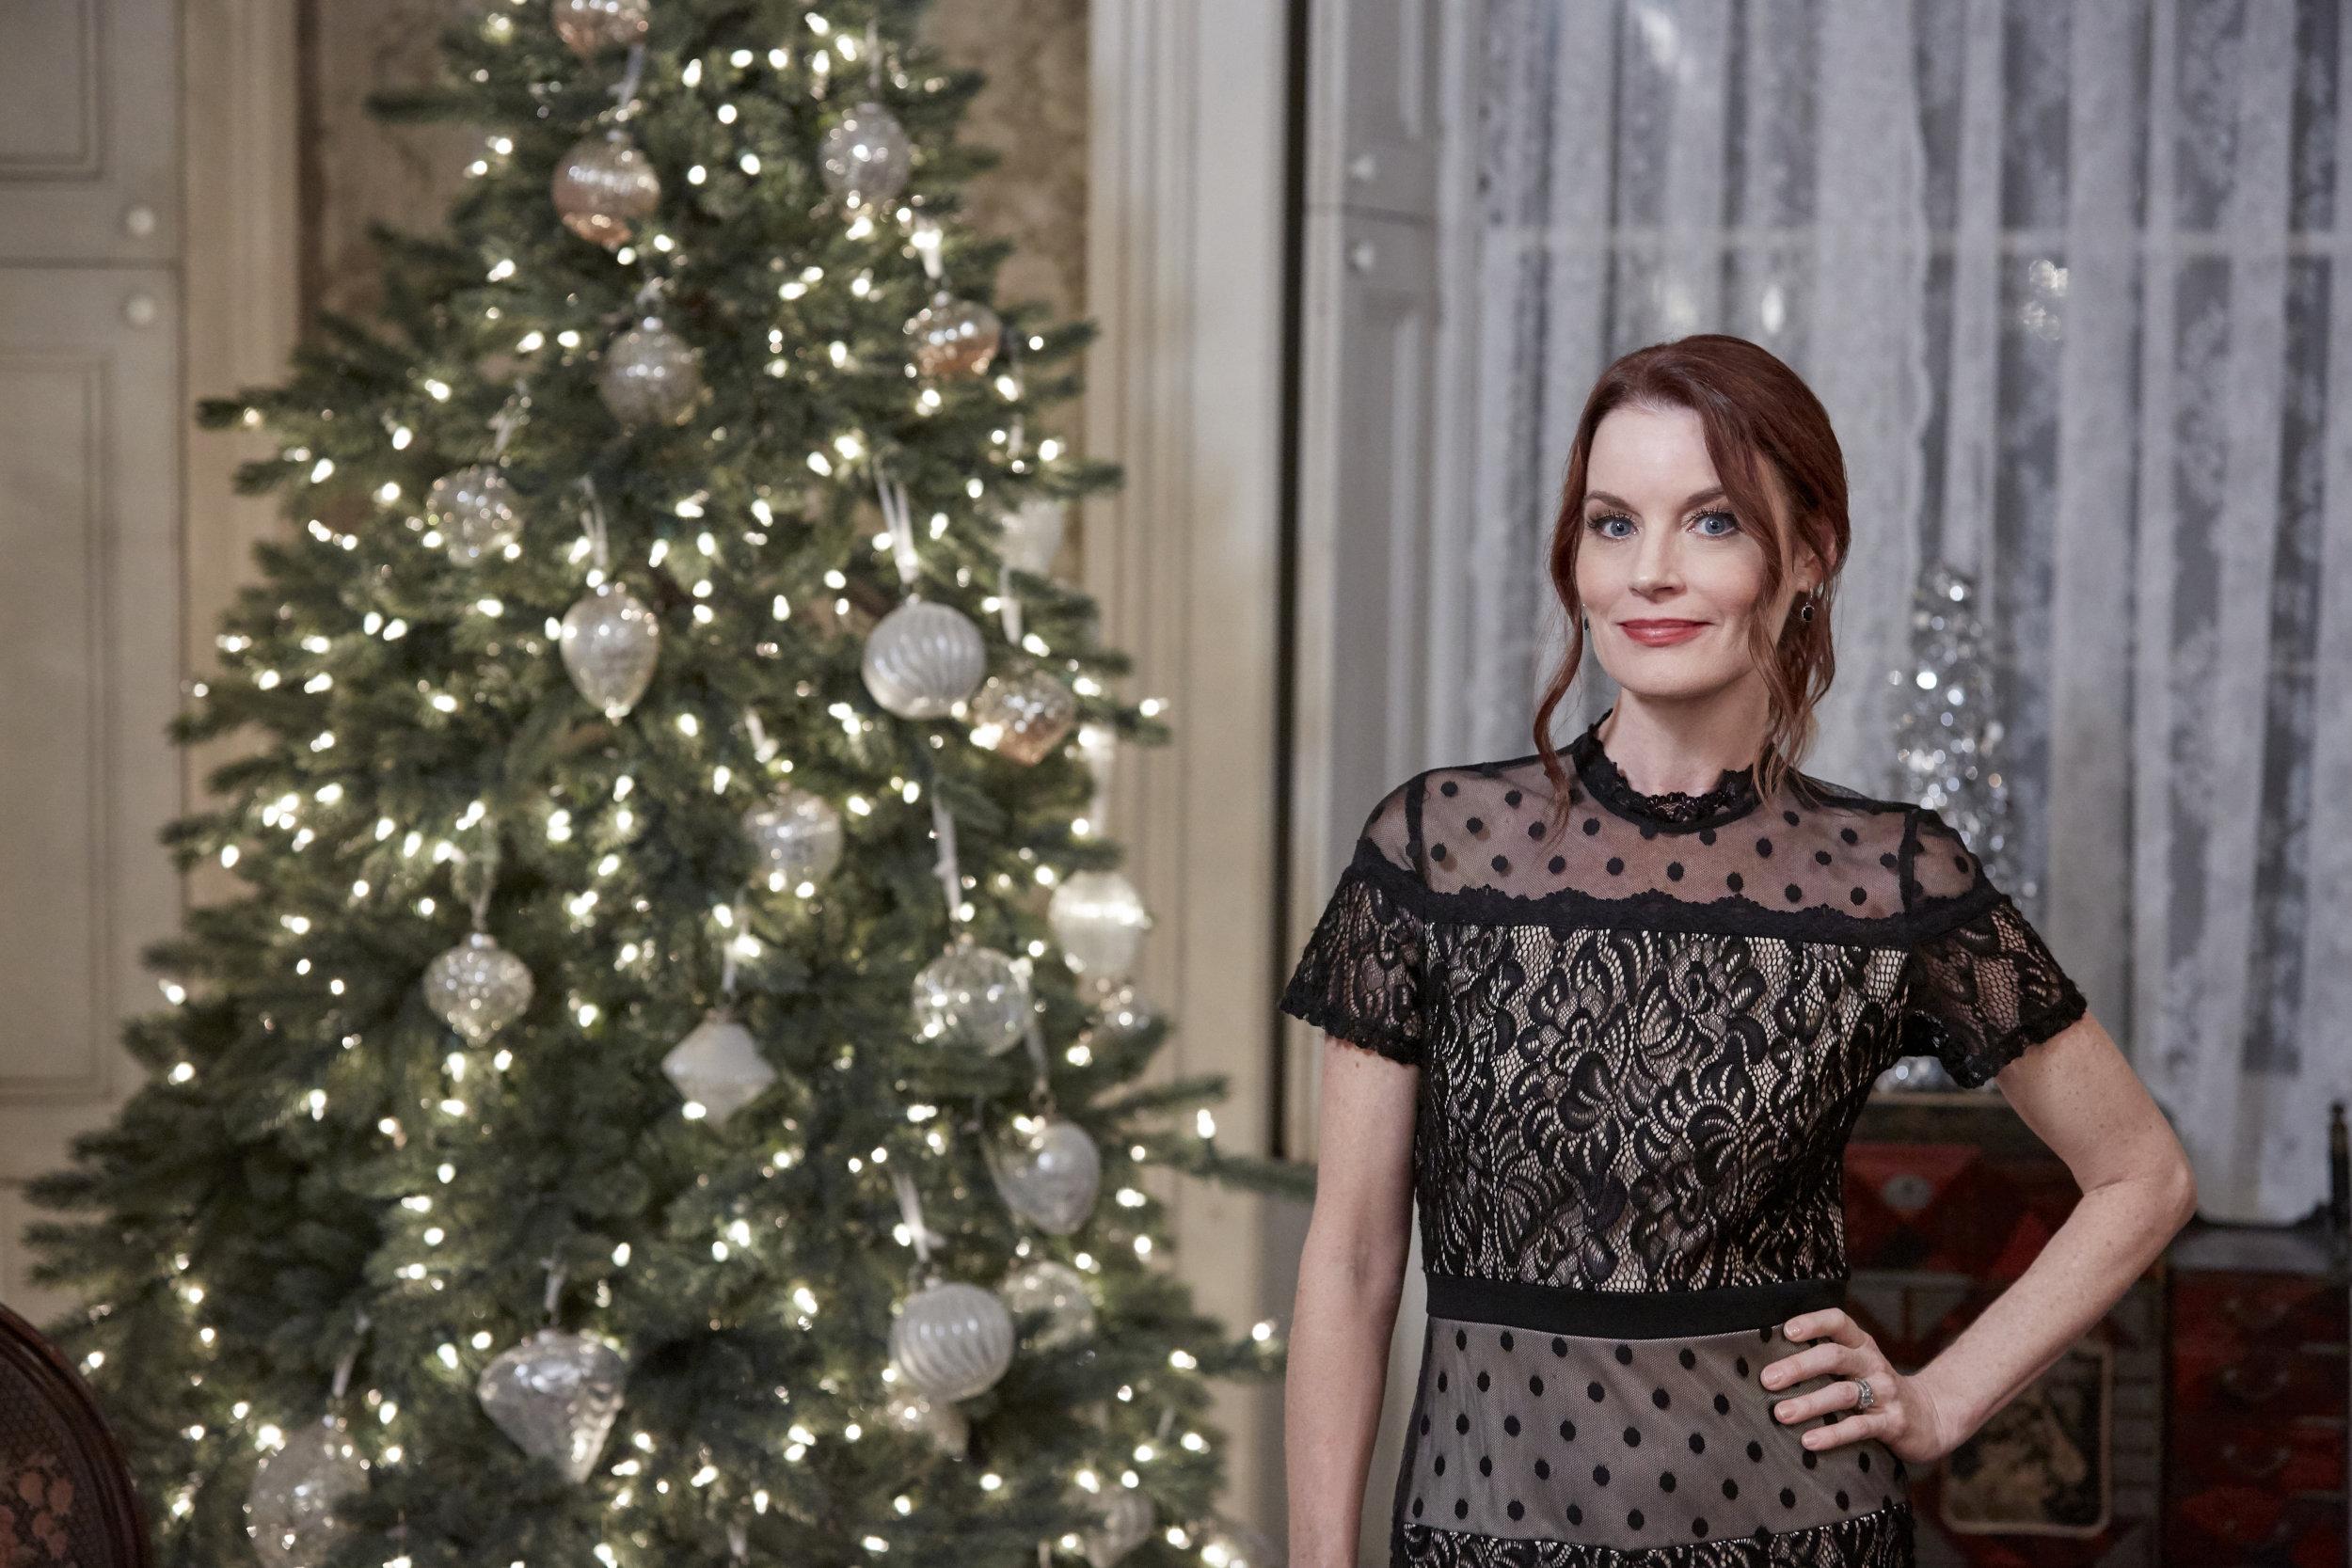 Cast Of Christmas On Honeysuckle Lane 2020 Laura Leighton as Andie on Christmas on Honeysuckle Lane